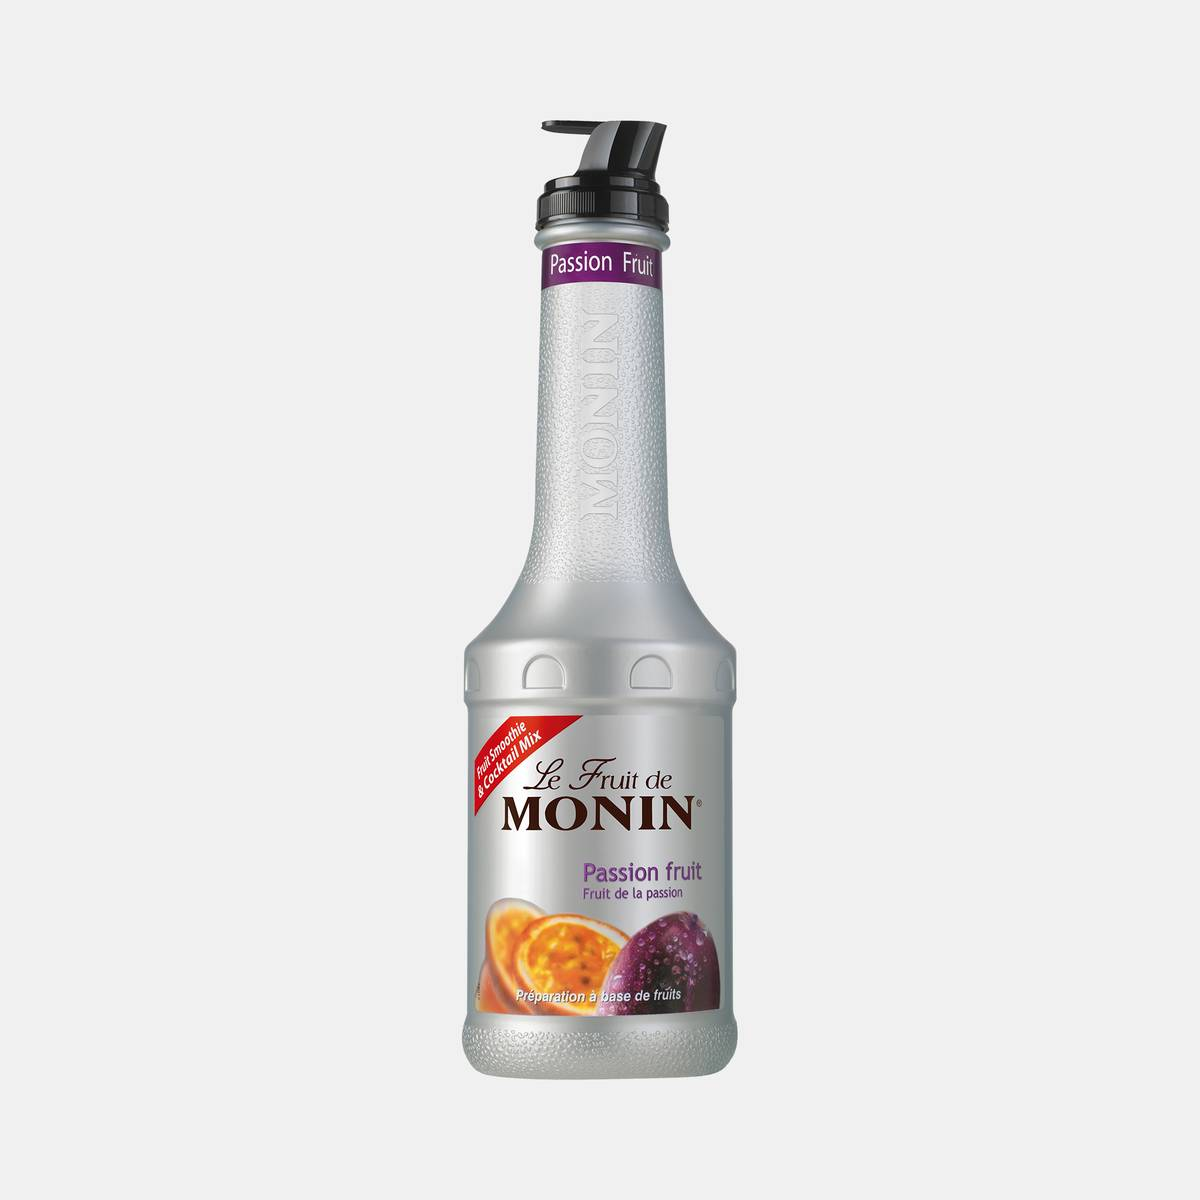 Monin Passion Fruit Puree Fruit Mix 1 Liter Bottle